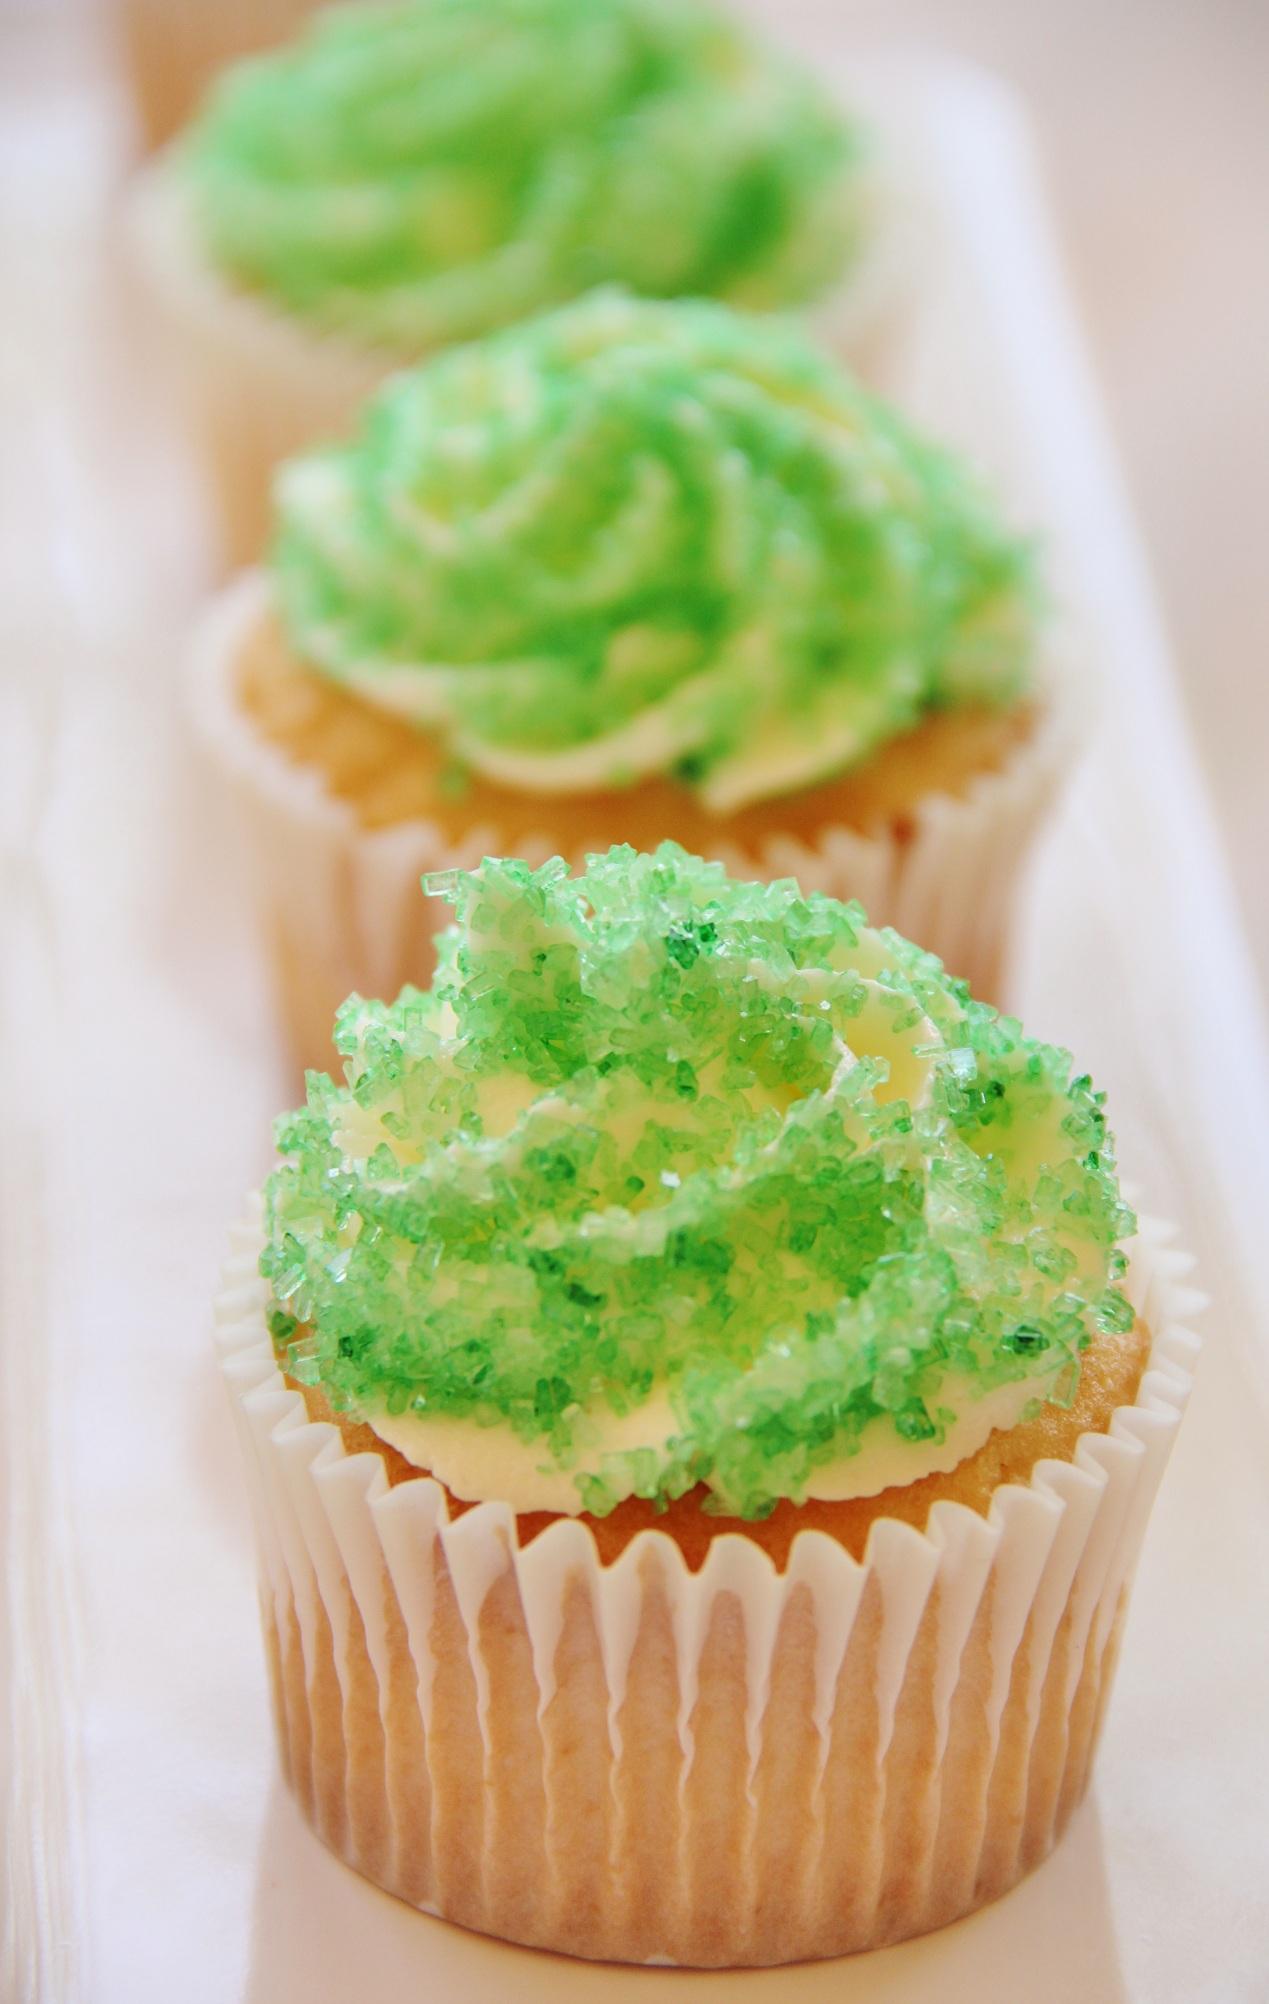 green treats st.patrick's day ventura ca marie shannon confections